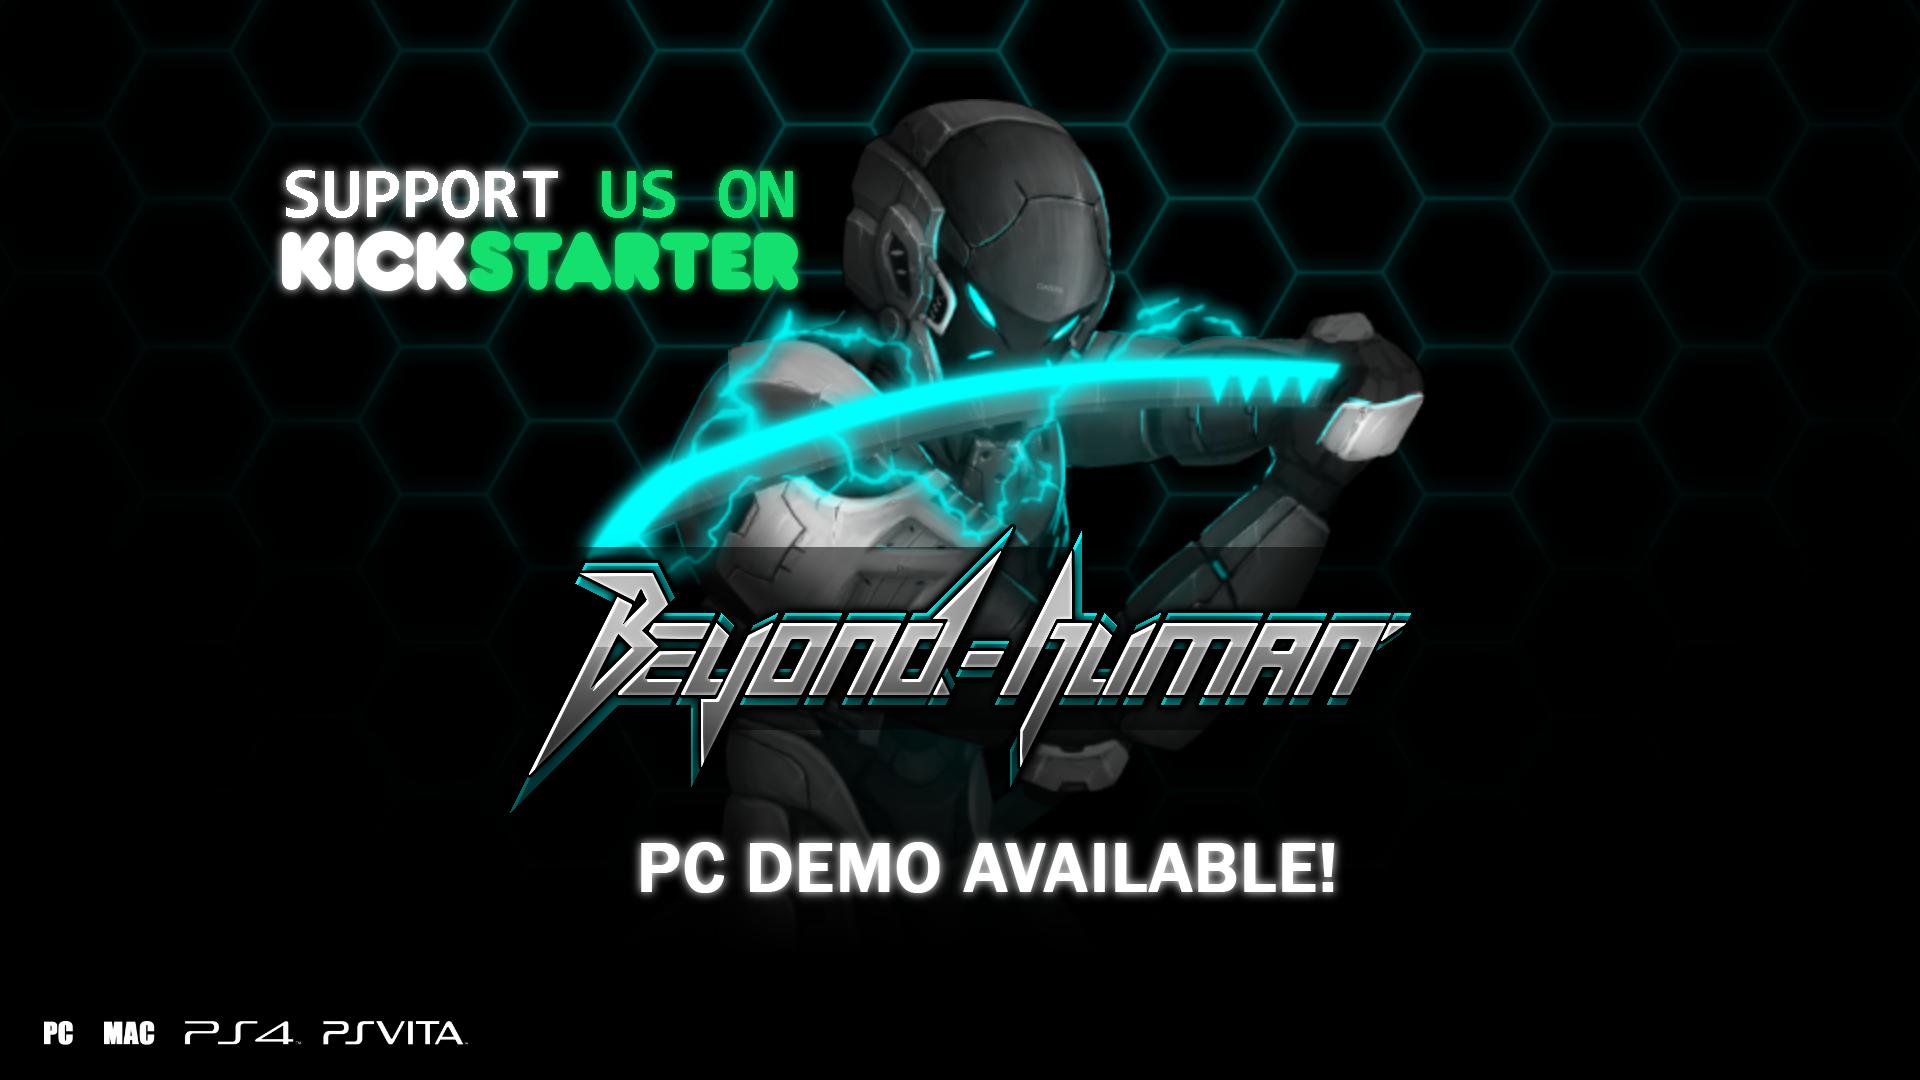 Beyond-Human Kickstarter Demo